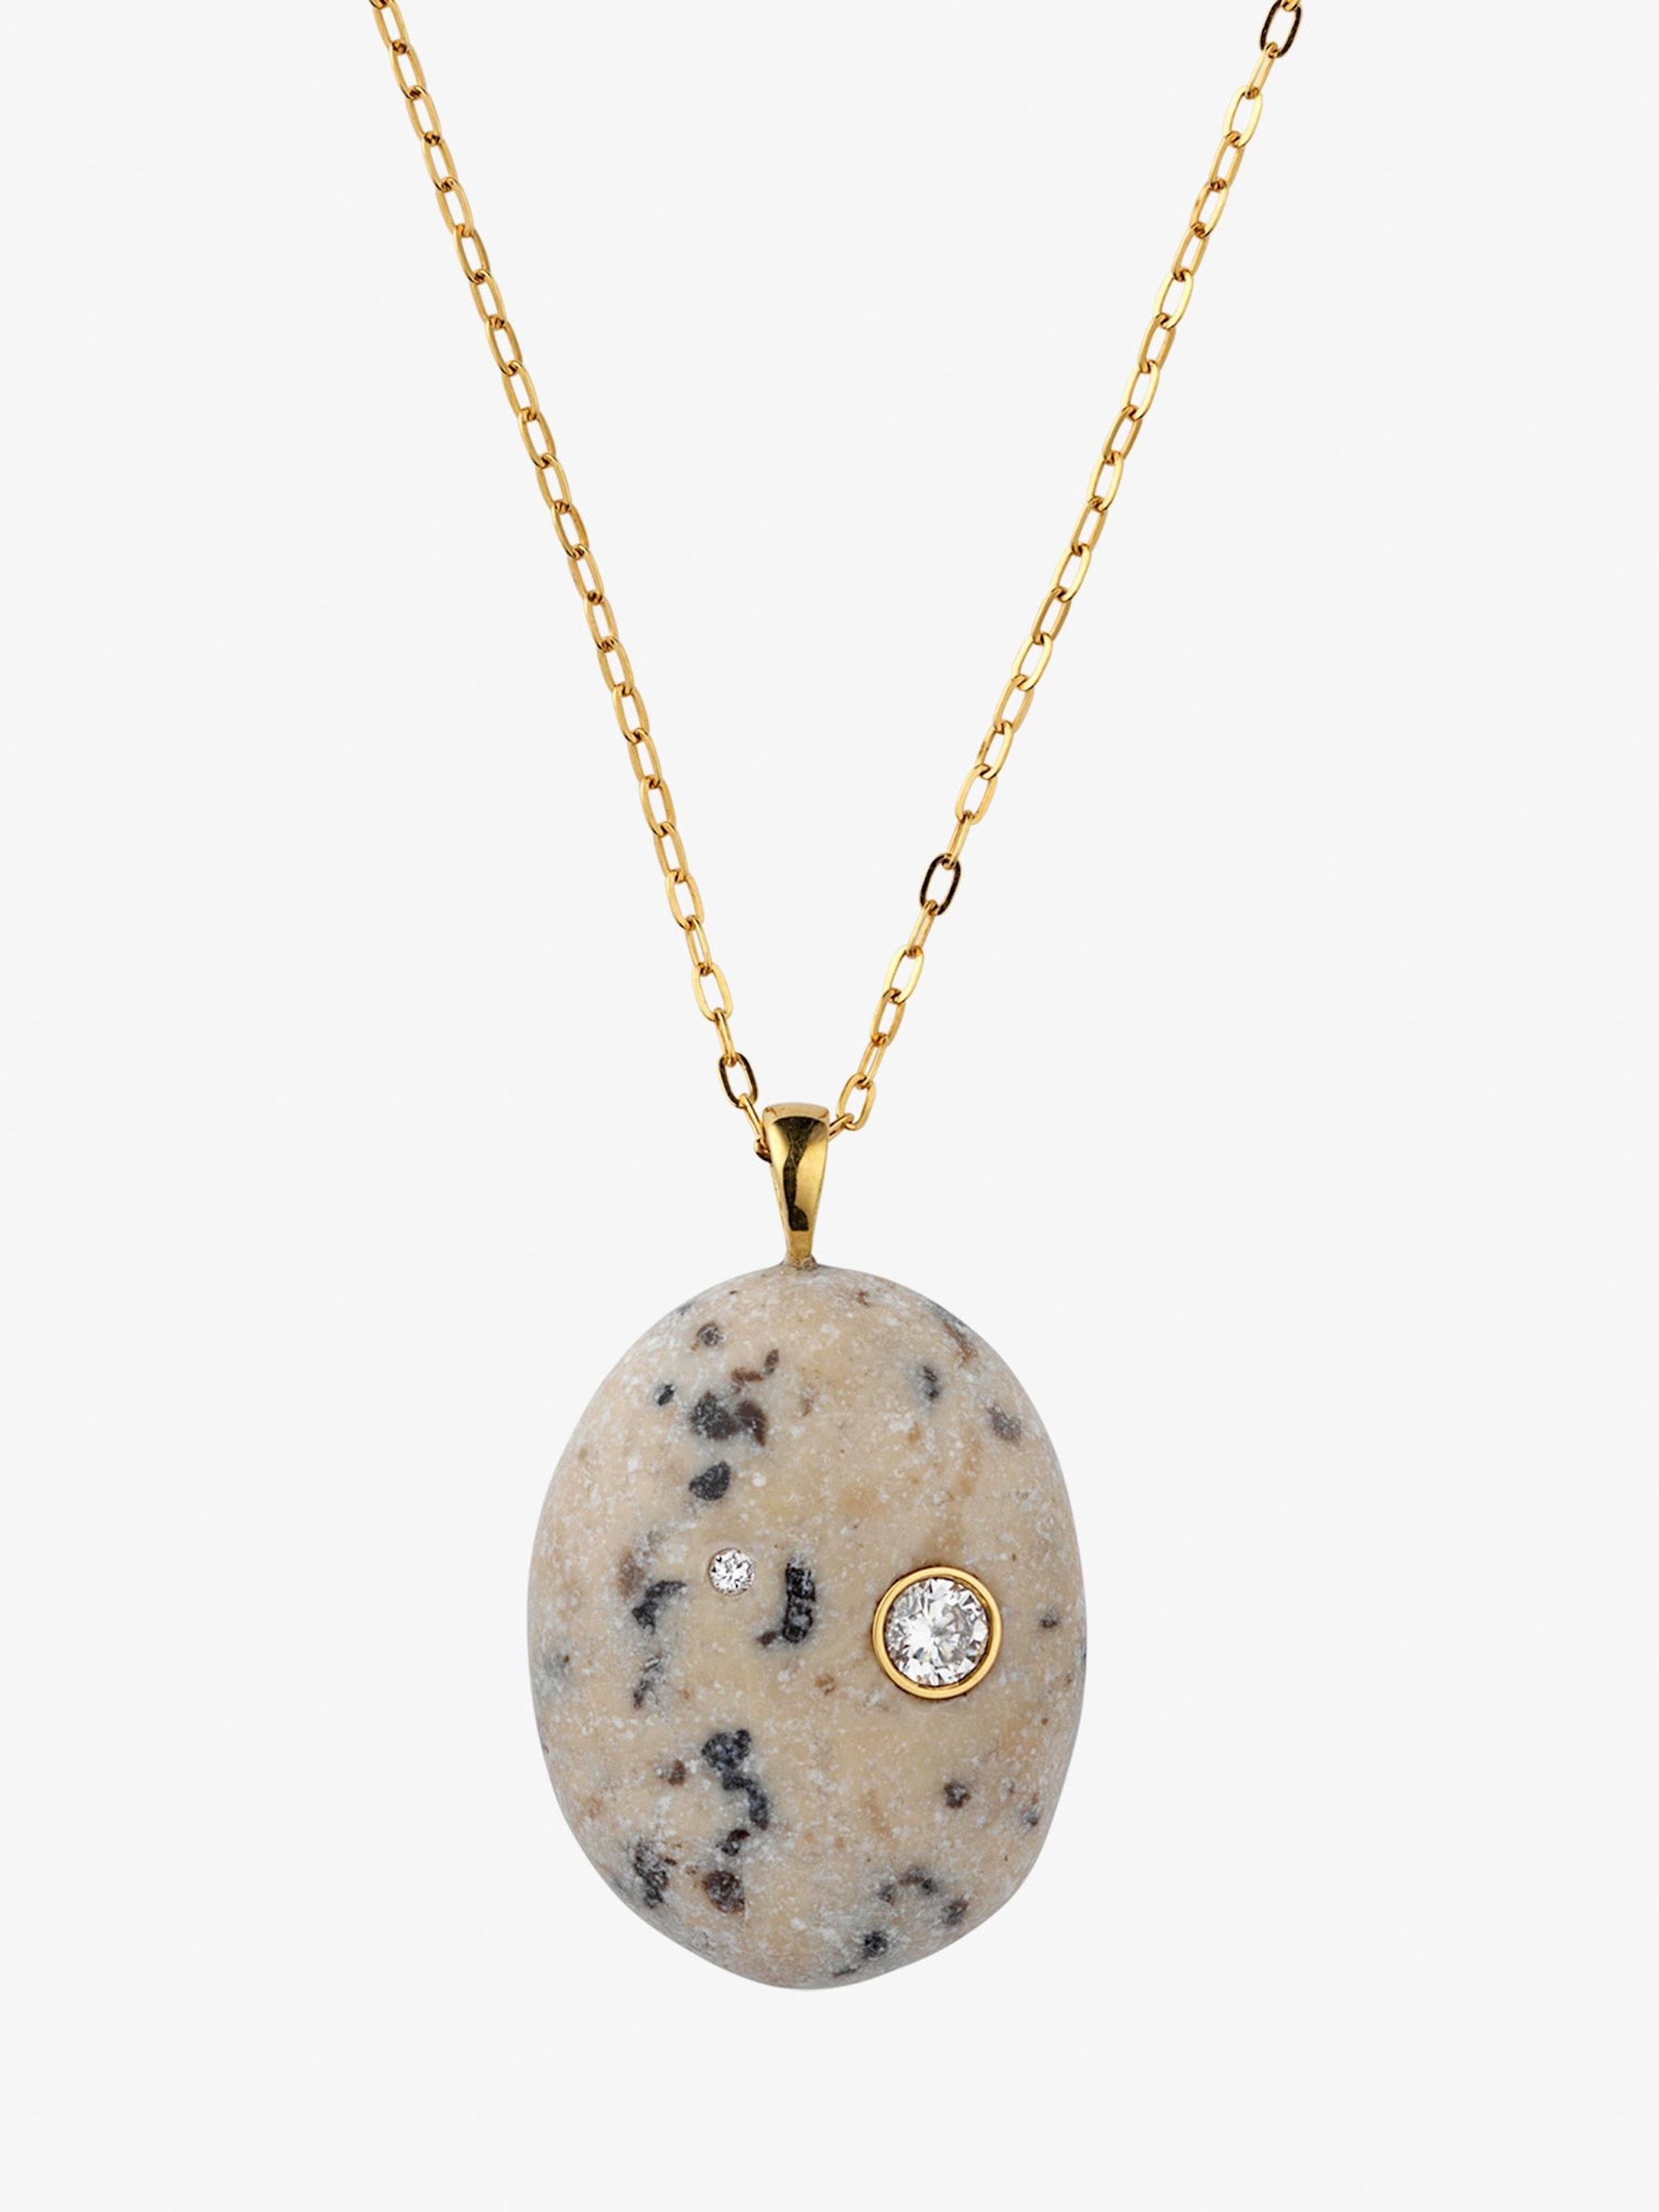 Sale e pepe gold, stone and diamond necklace photo 3